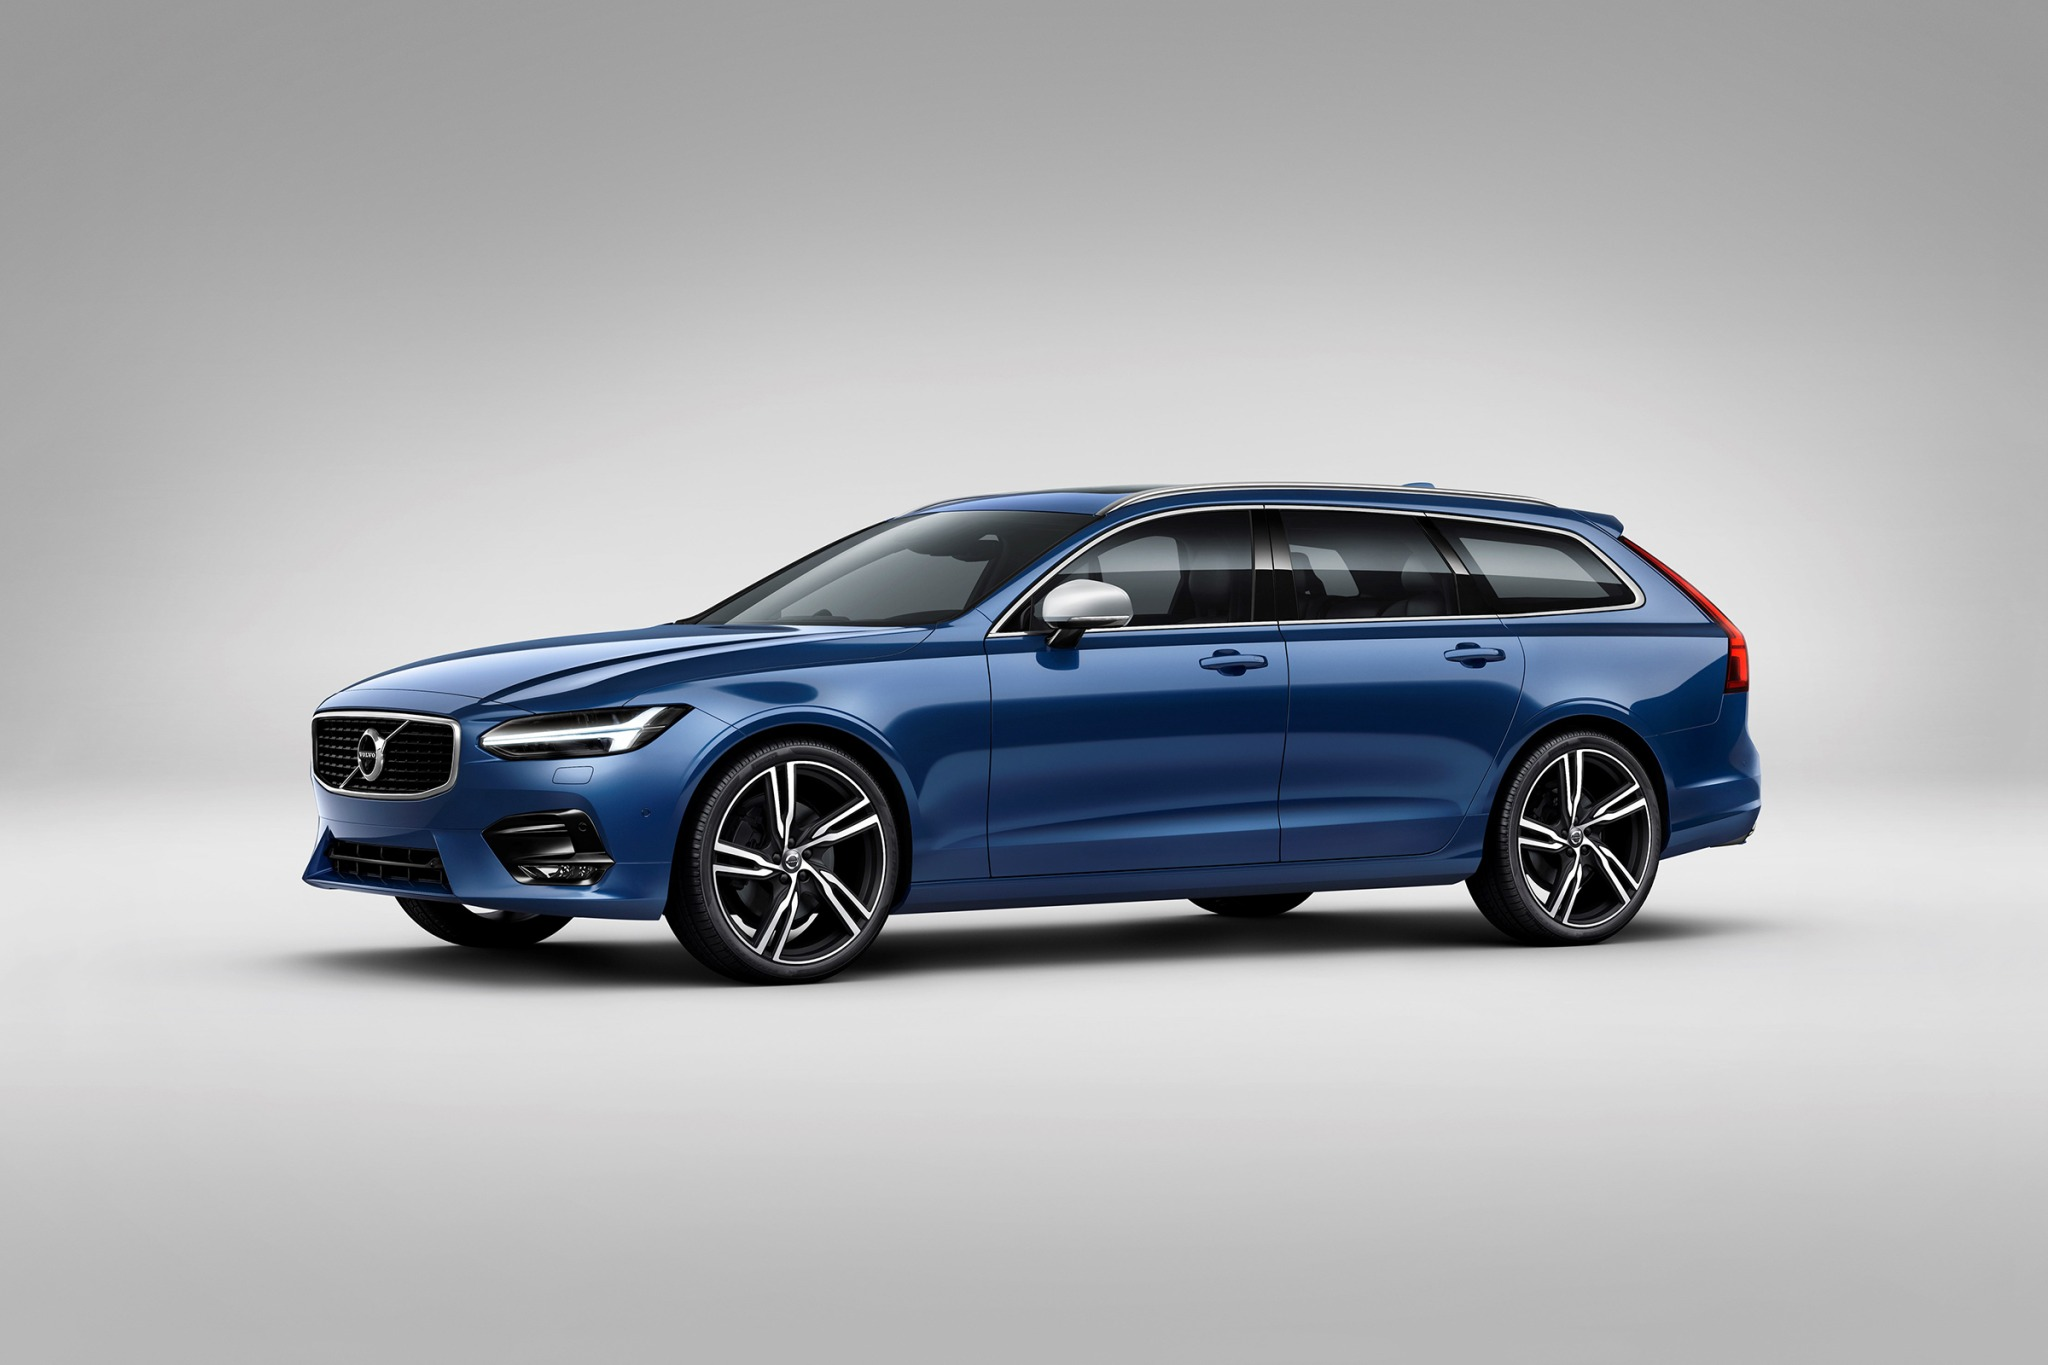 2018 volvo v90 wagon t6 r design fq oem 1 2048